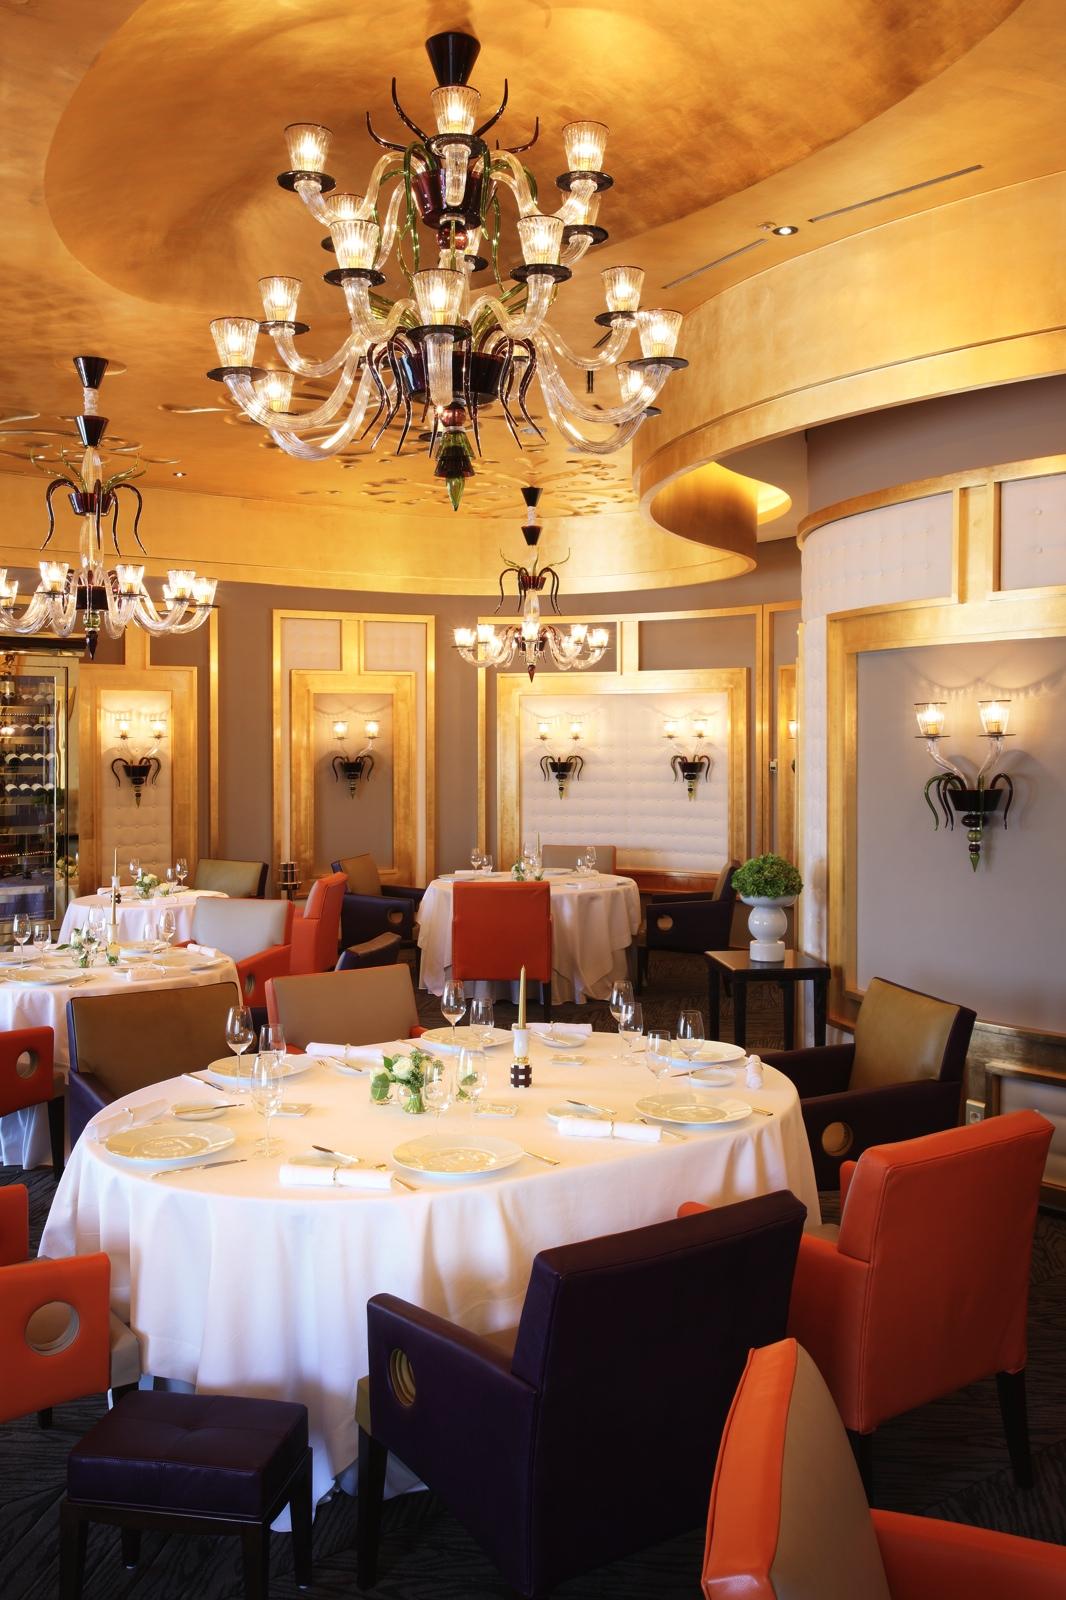 pierre-gagnaire-restaurant-seoul-olivier-gagnere-veronese-9